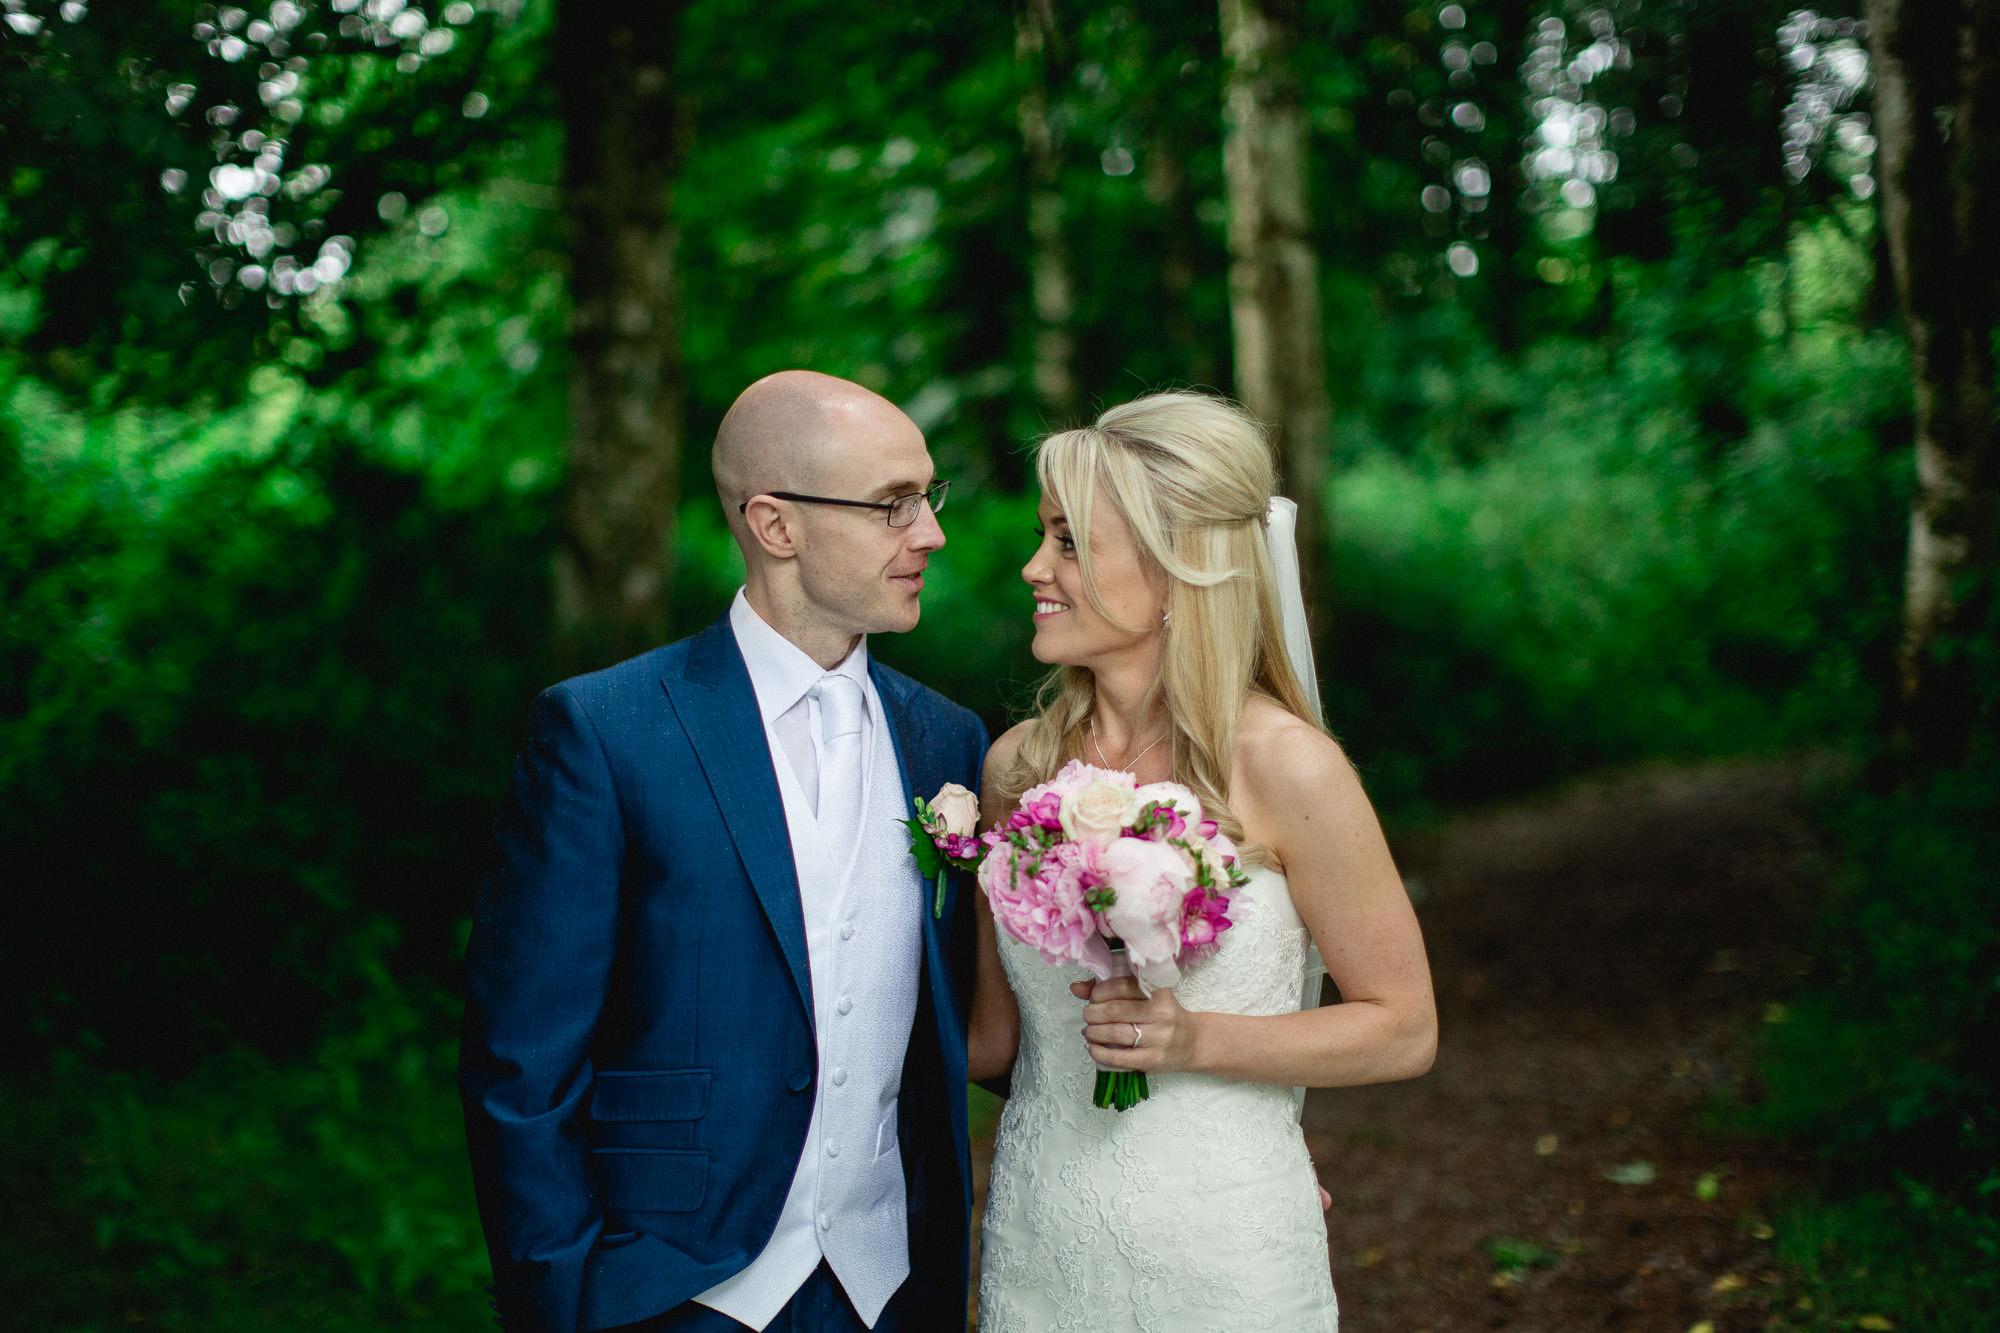 CLAIREBYRNEPHOTOGRAPHY-WEDDING-Ireland-tulffaris-alternative-fun-Lisa-terry-4.jpg